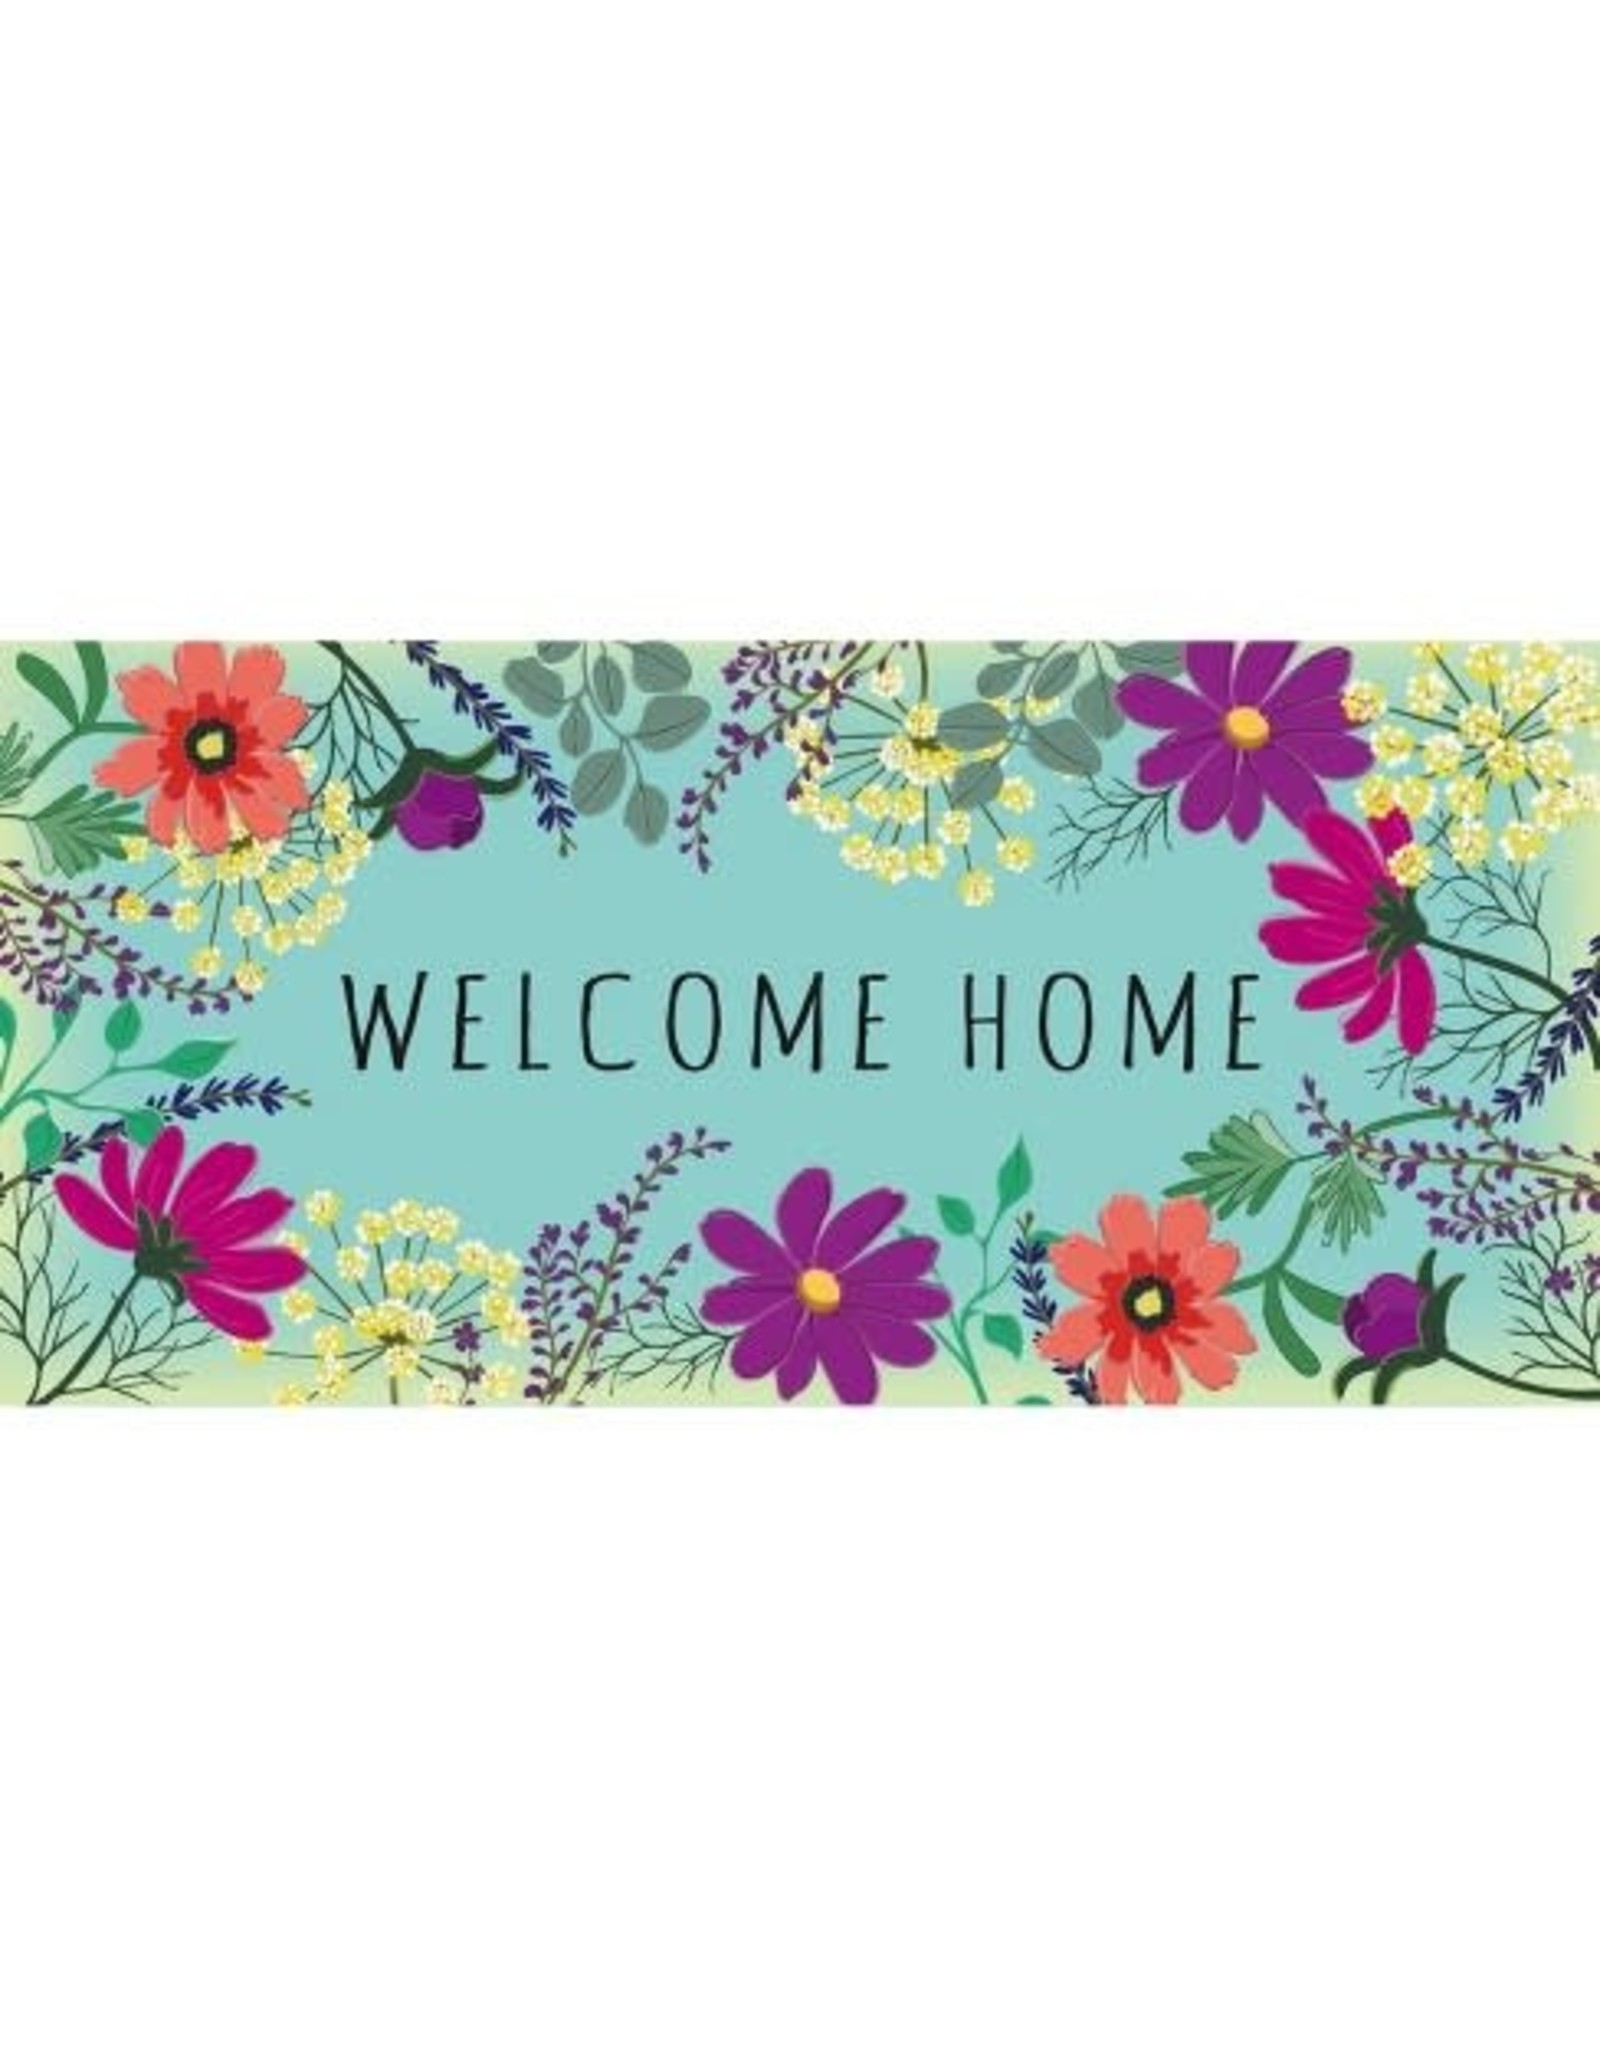 Evergreen Enterprises Wild Flowers Welcome Sassafras Switch Mat